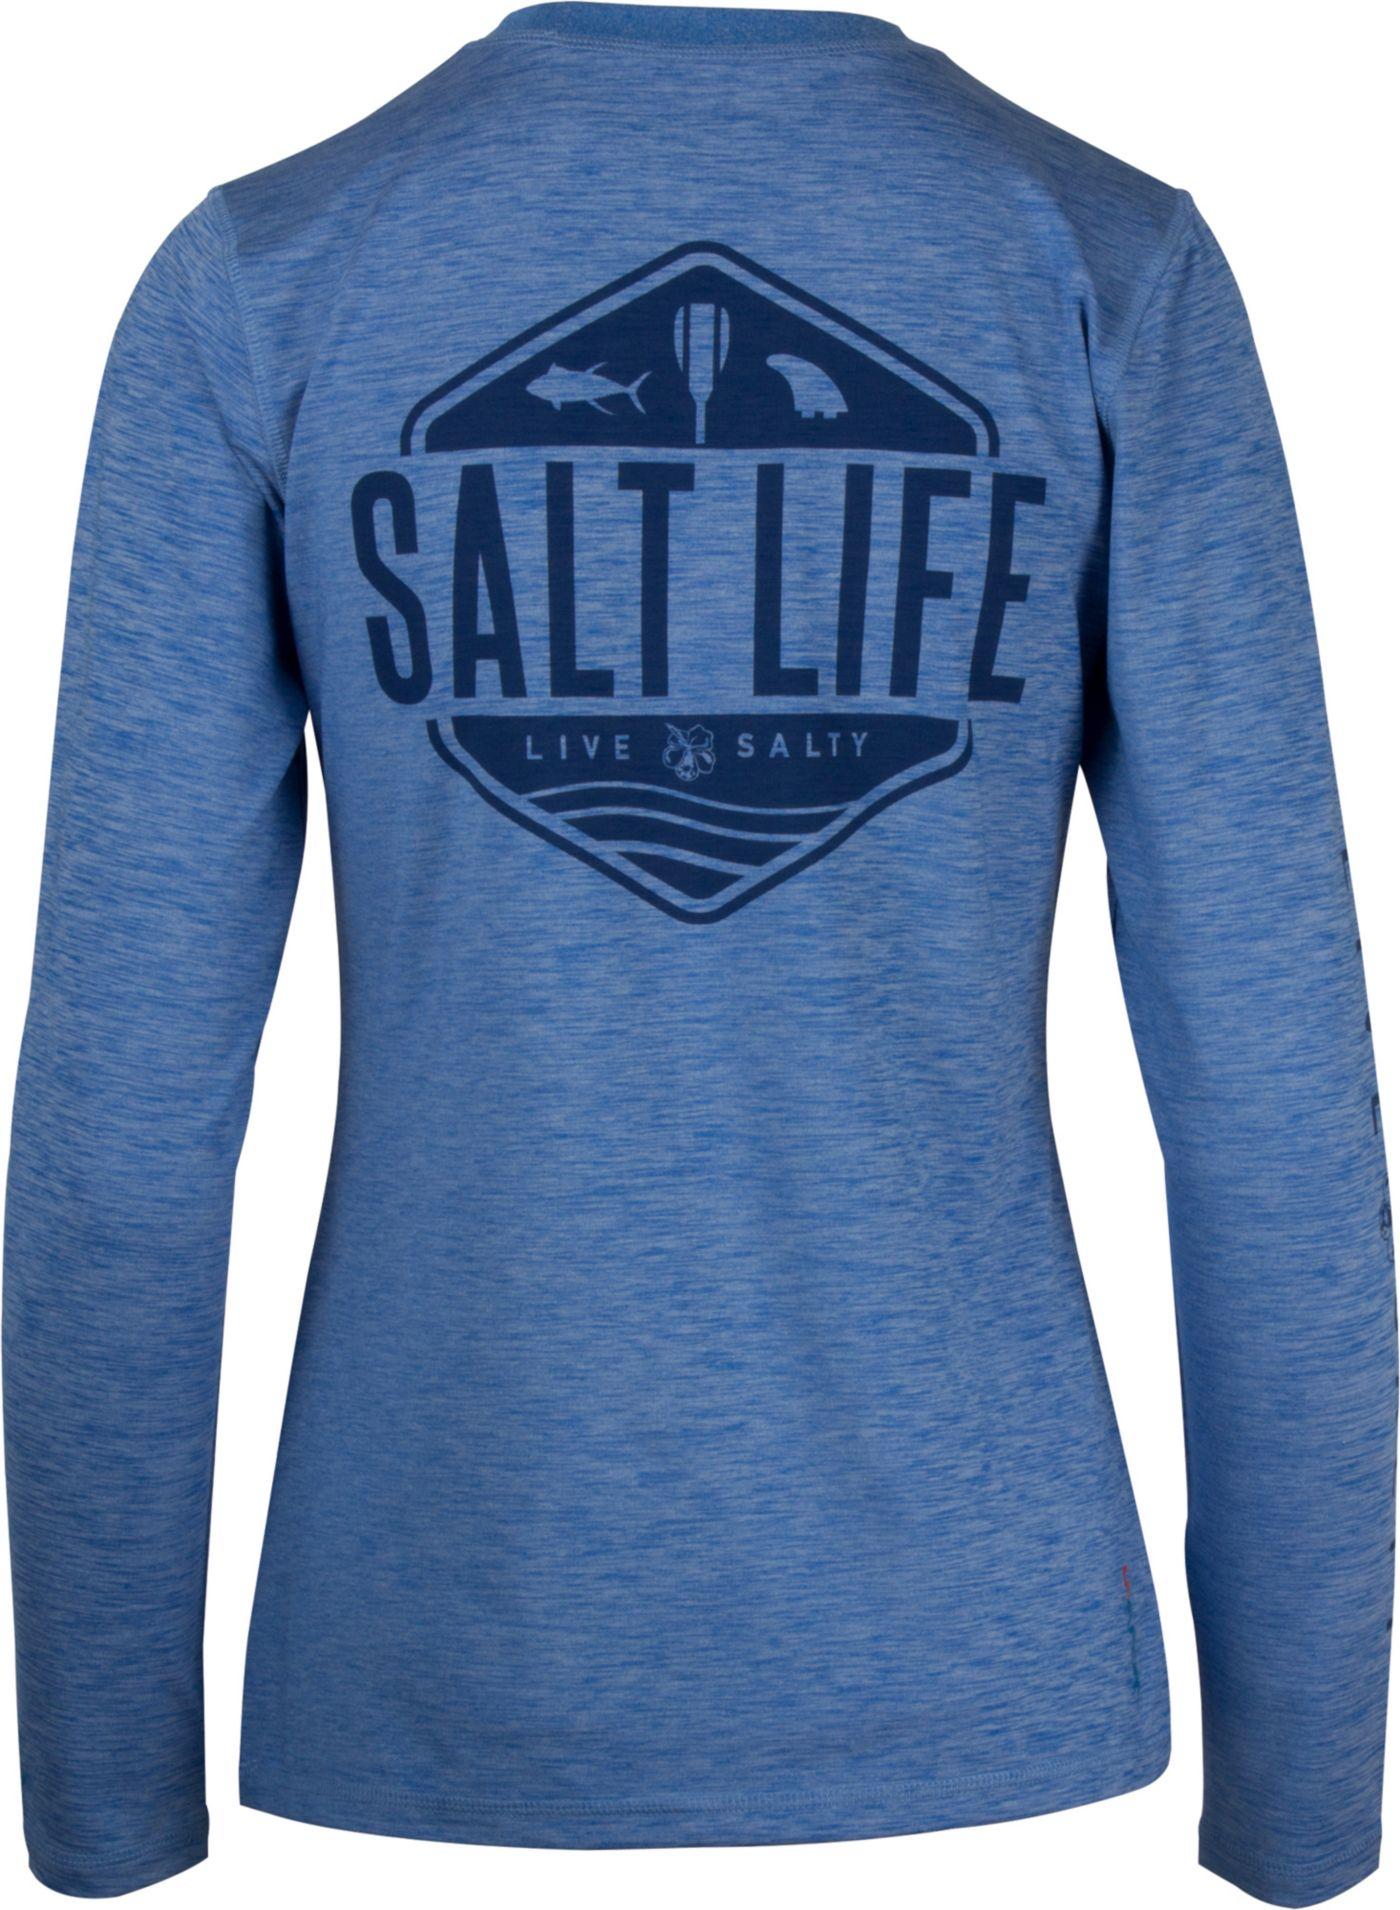 Salt Life Women's Fish Paddle Board Long Sleeve Shirt